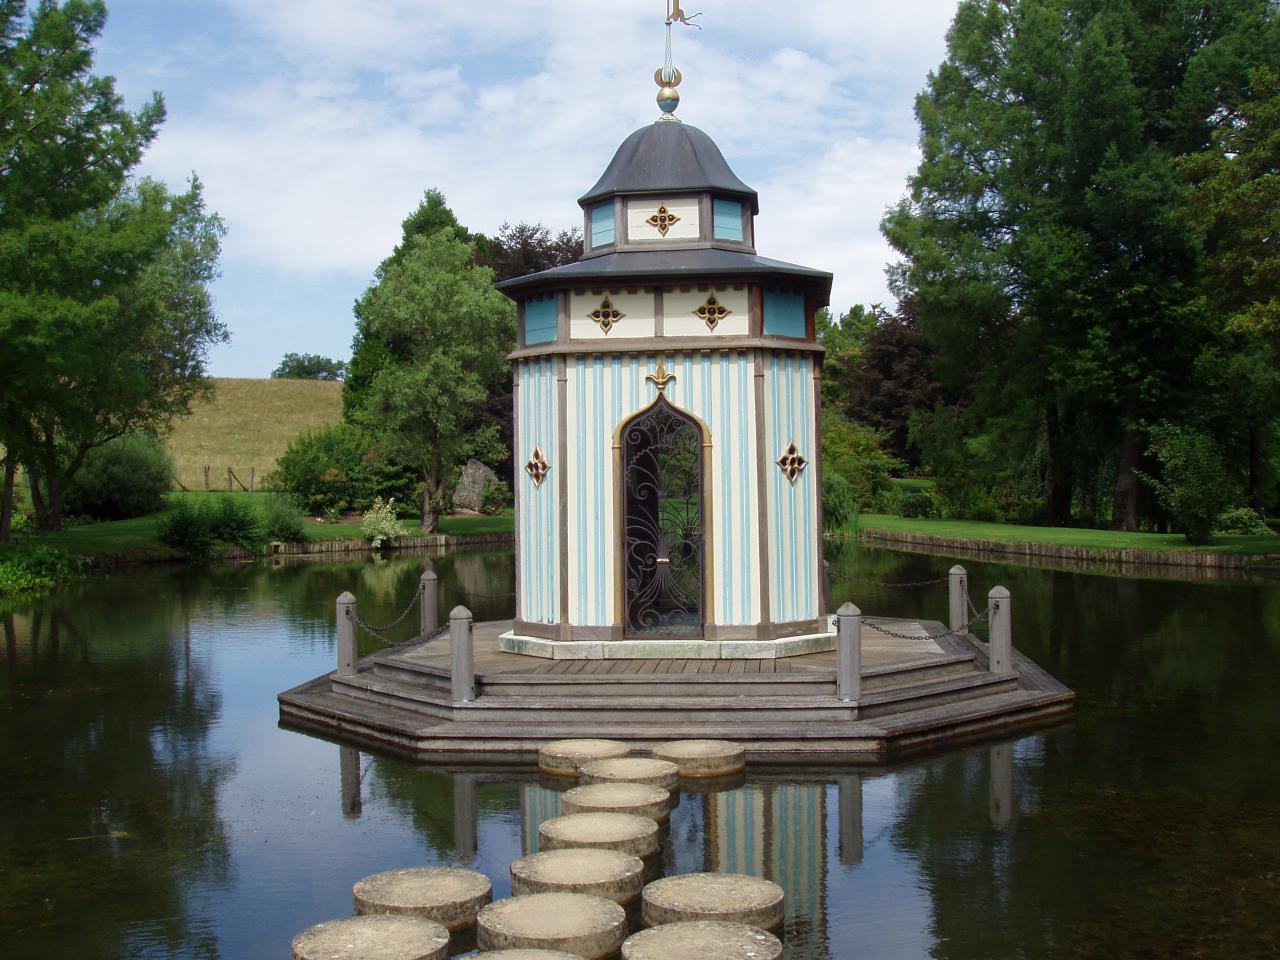 le pavillon Turc